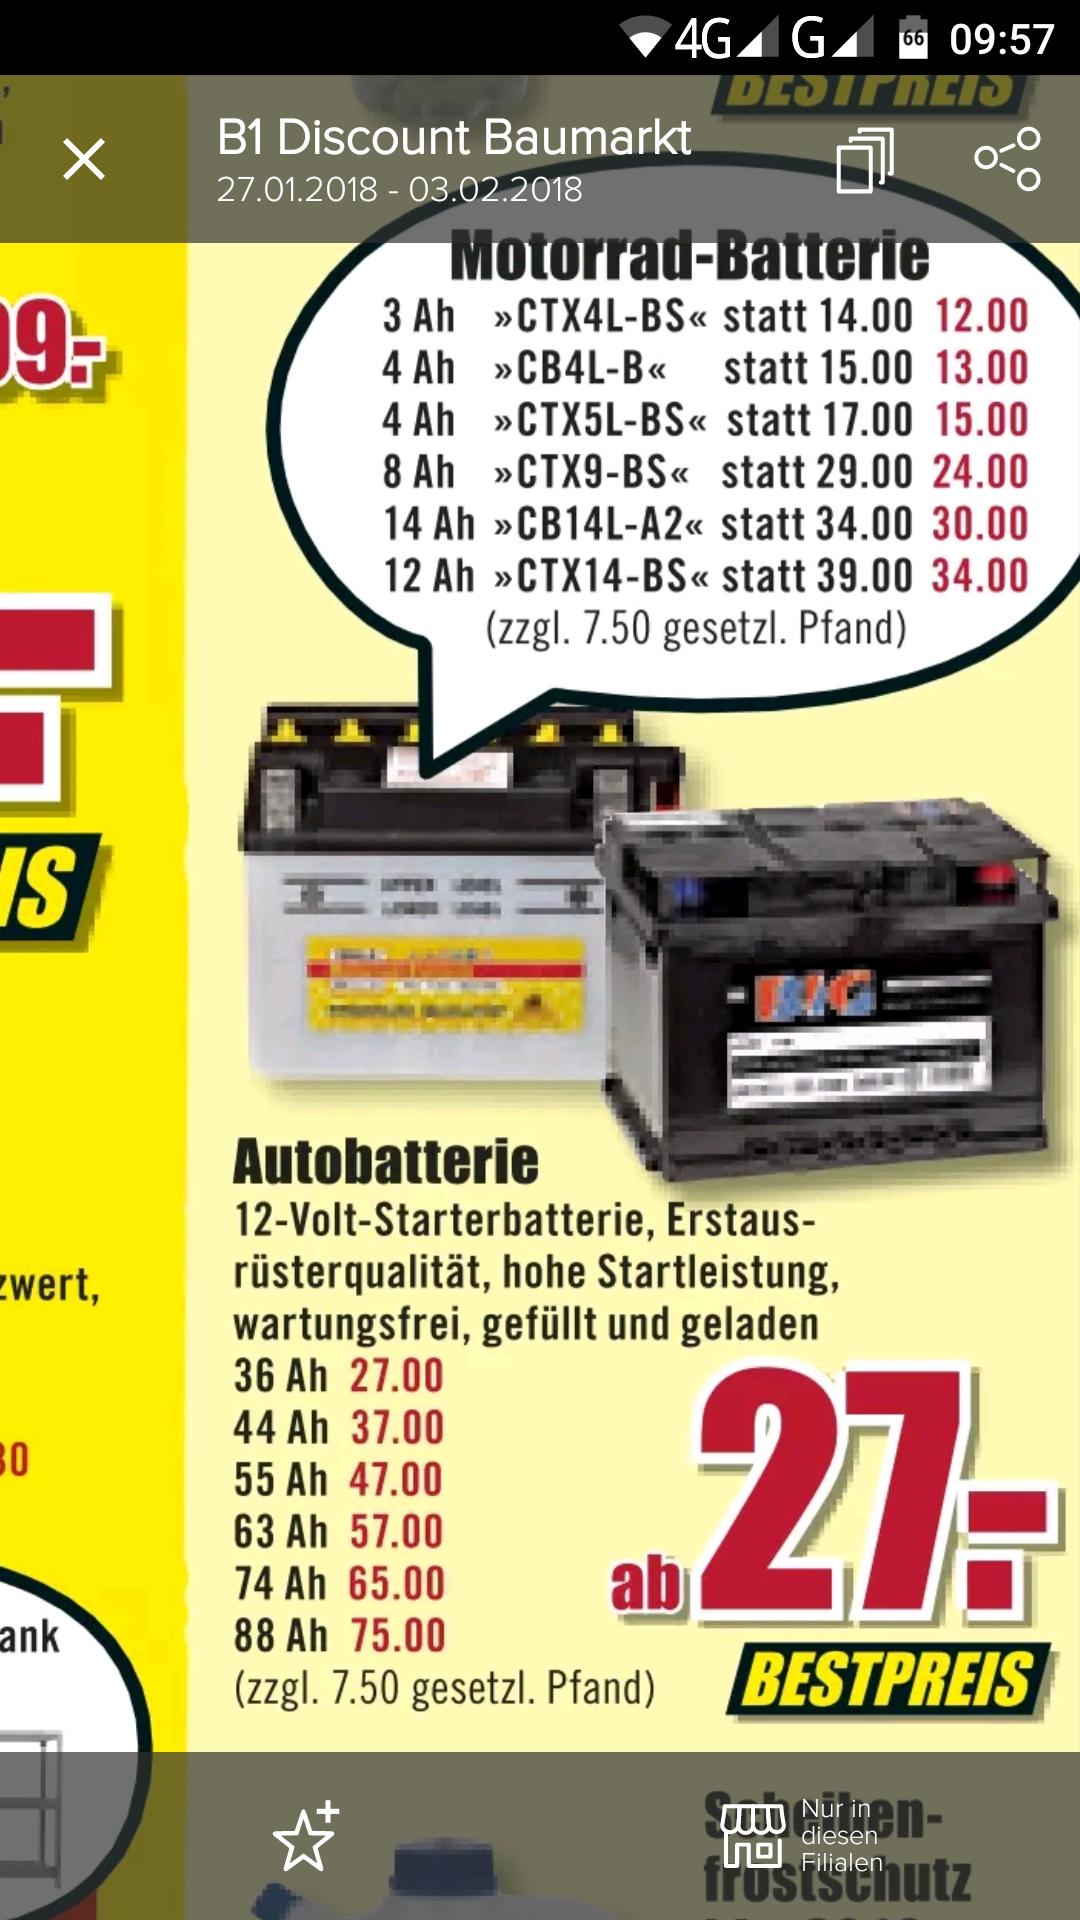 B1 Discount Baumarkt Auto/Motorrad Batterien ( BIG )